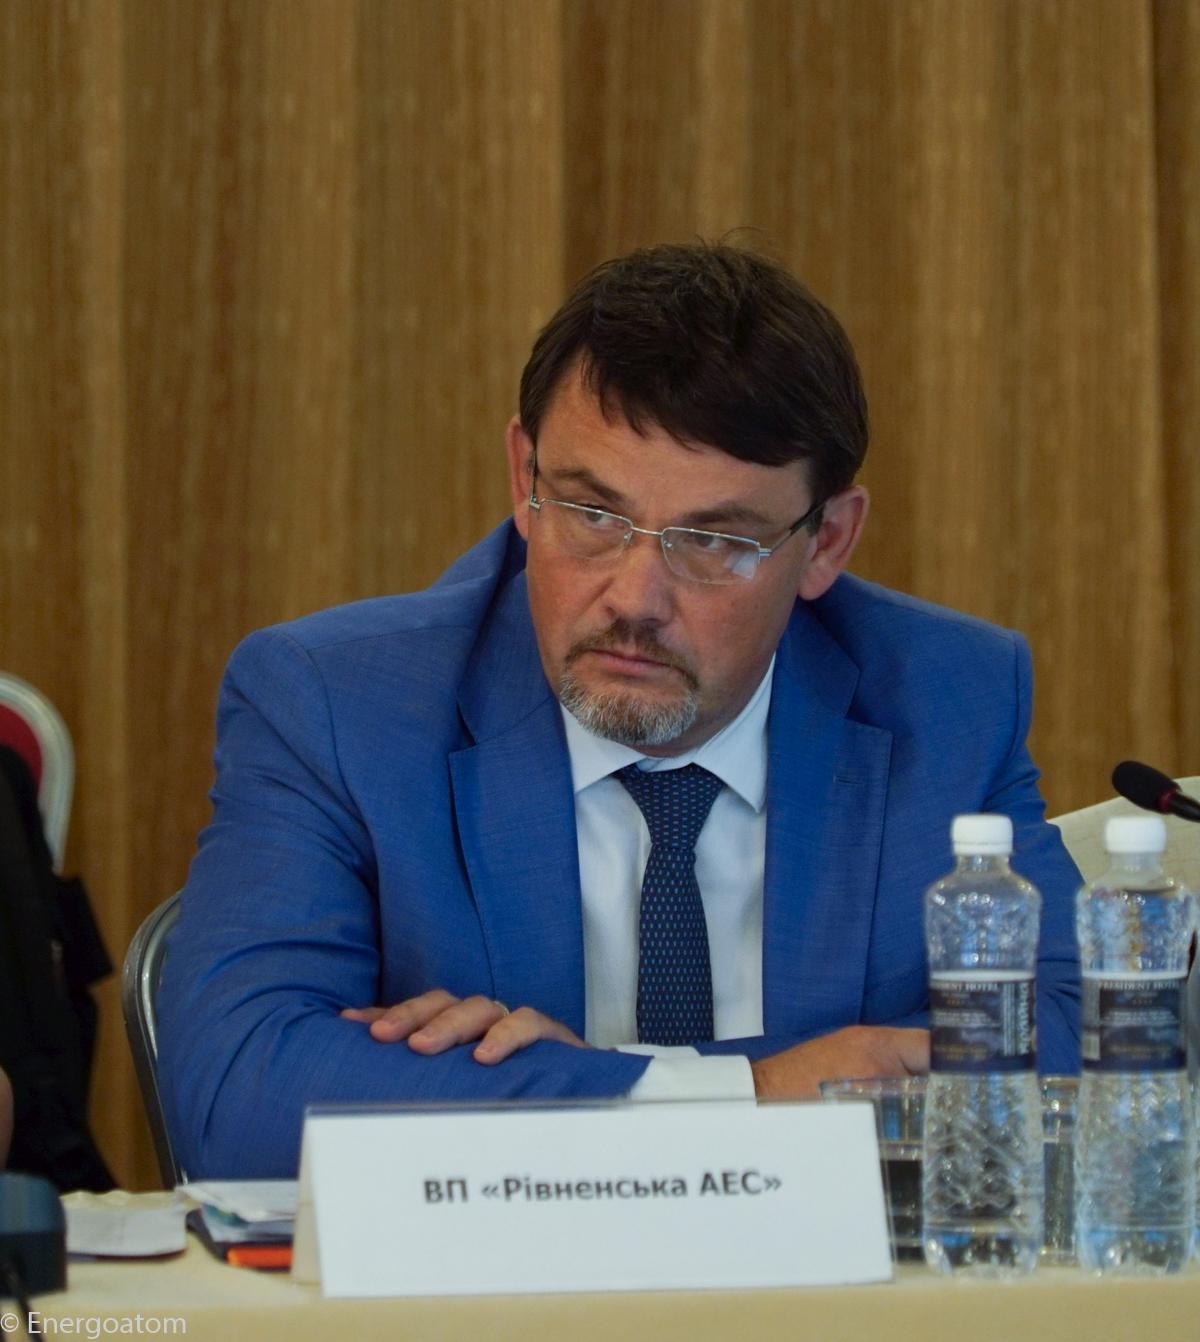 Директор Рівненської АЕС Павло Павлишин